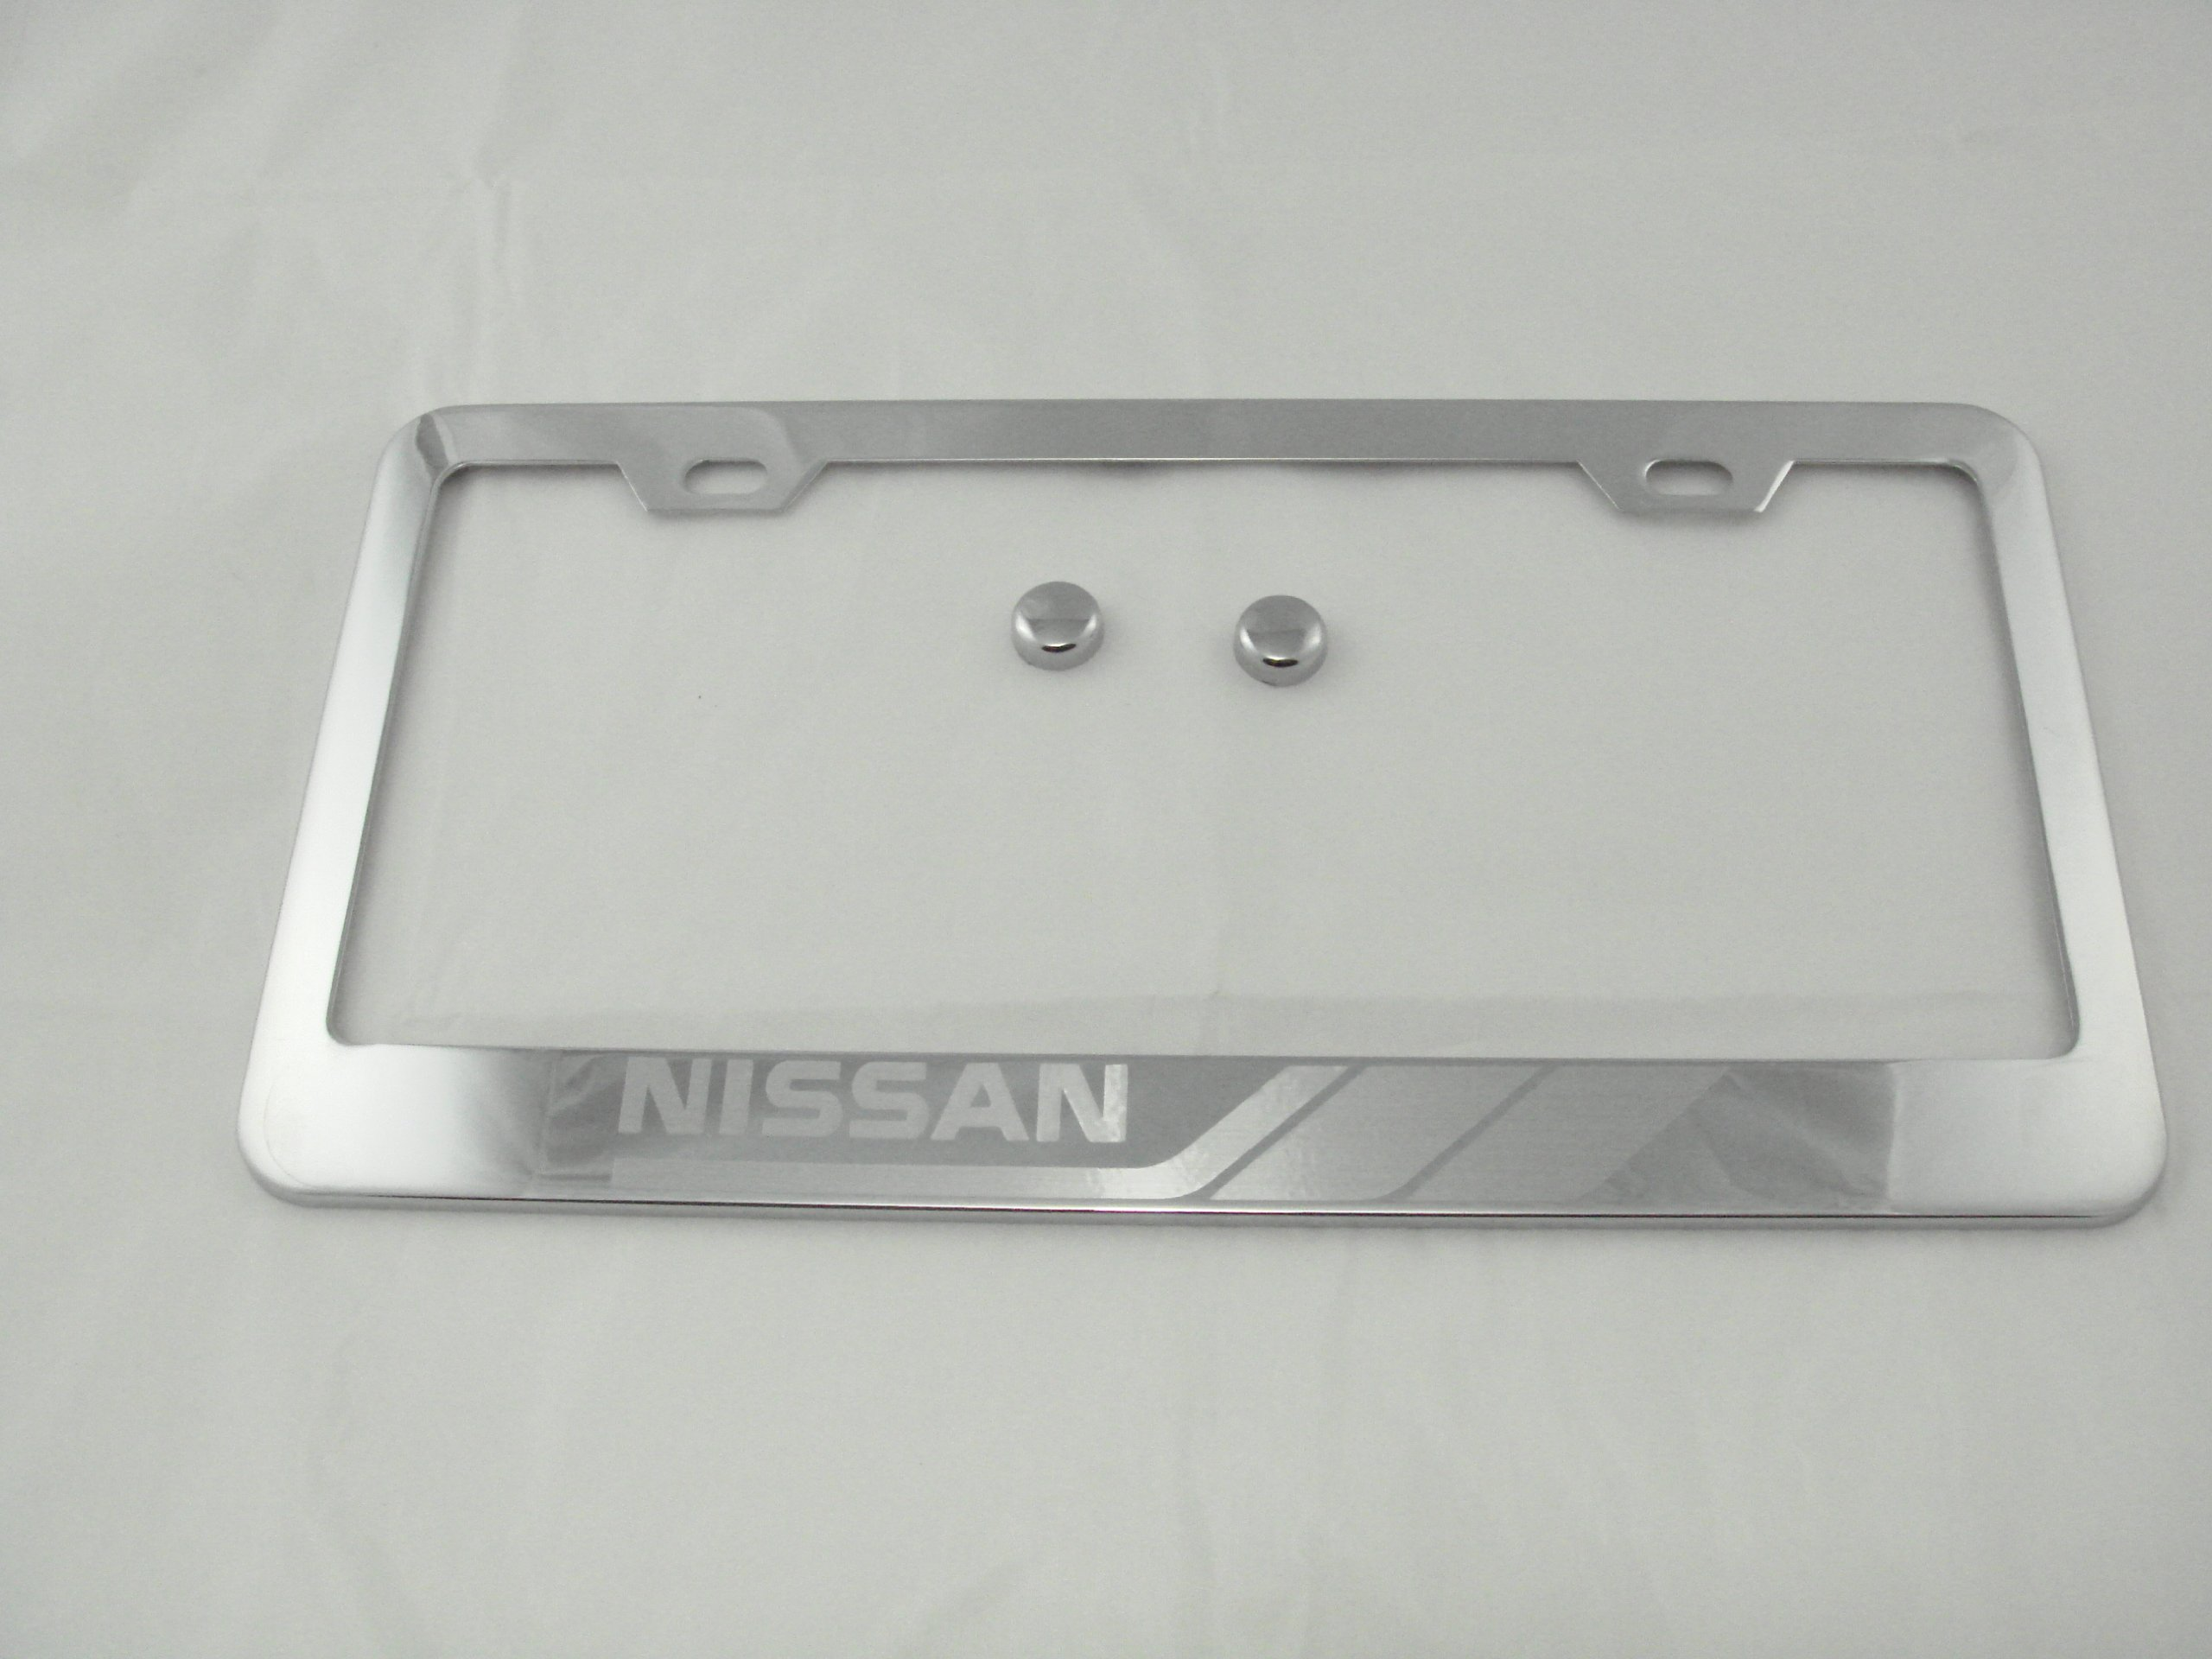 Tuesnut 2X Stainless Steel Black Carbon Fiber Vinyl License Plate Frame Covers Holder Screws Caps Rust Free for Nissan